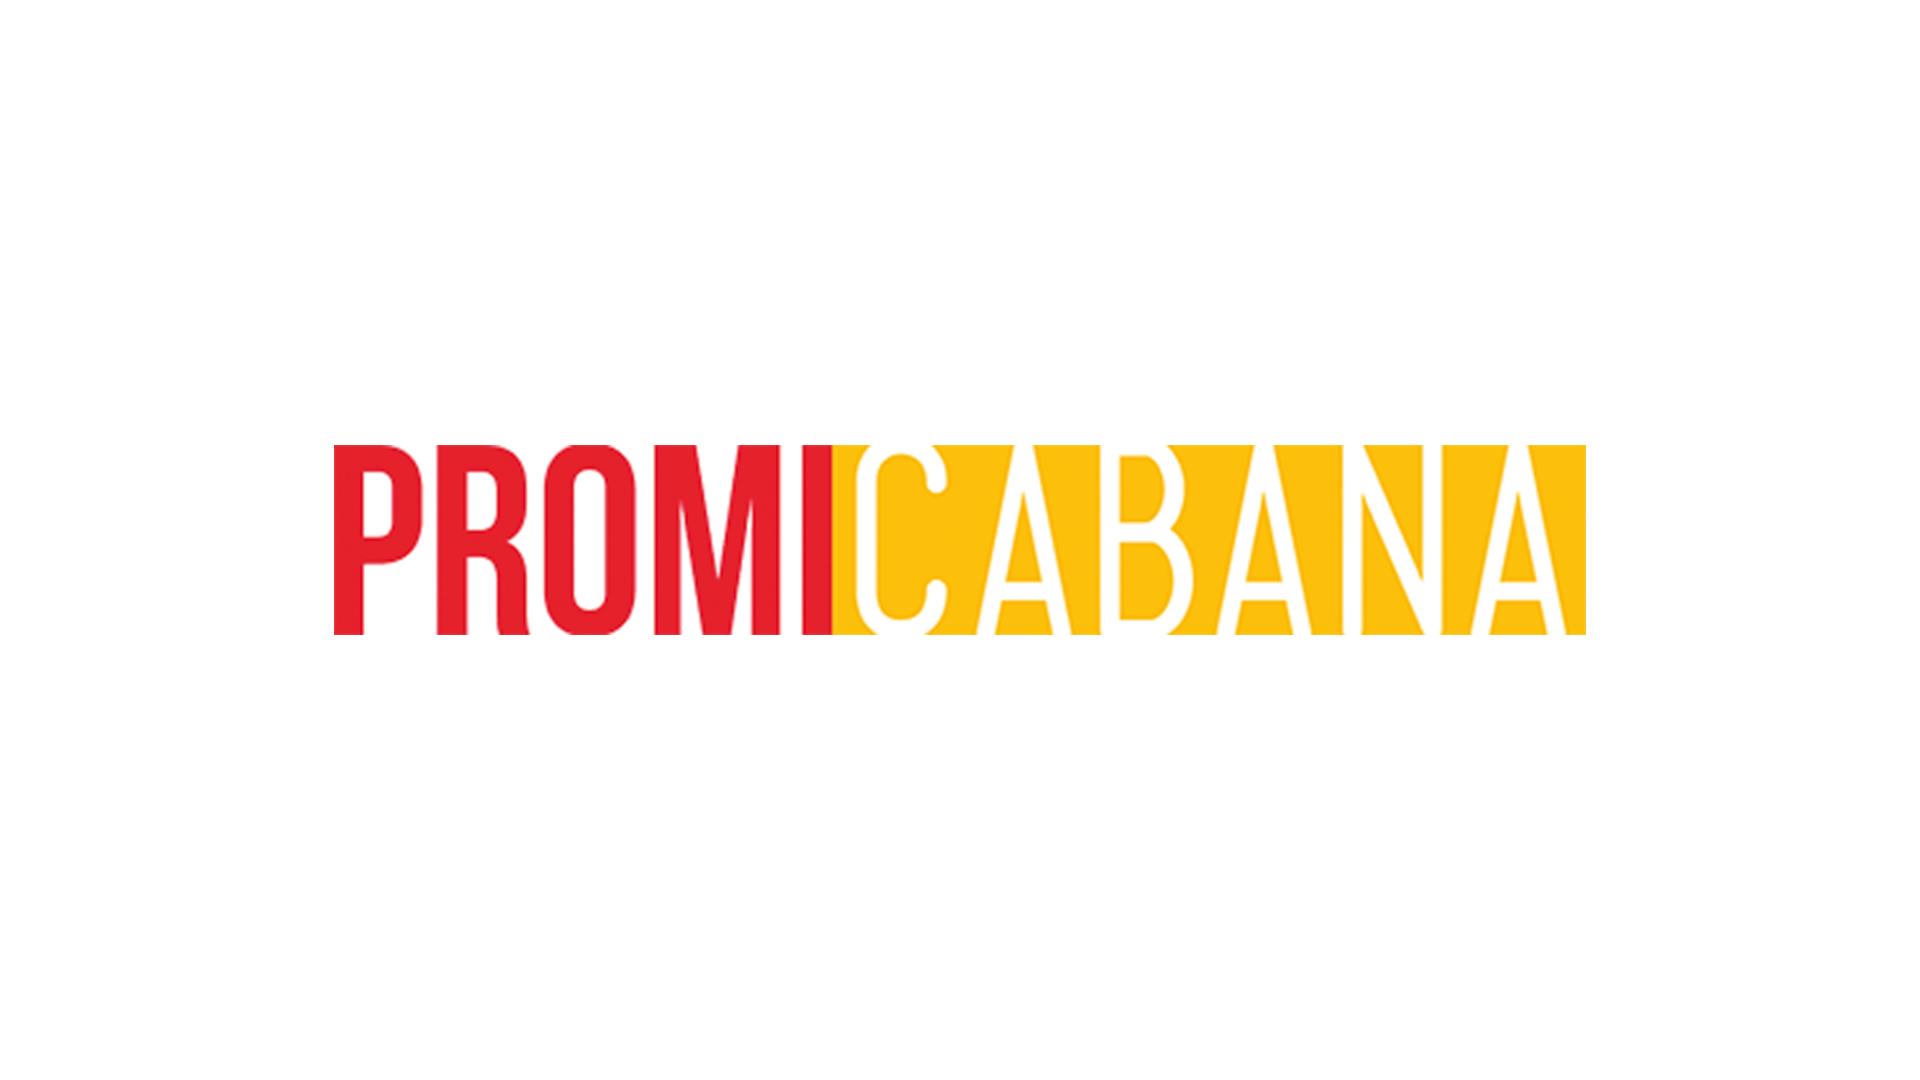 Selena-Gomez-Videobotschaft-George-Shelley